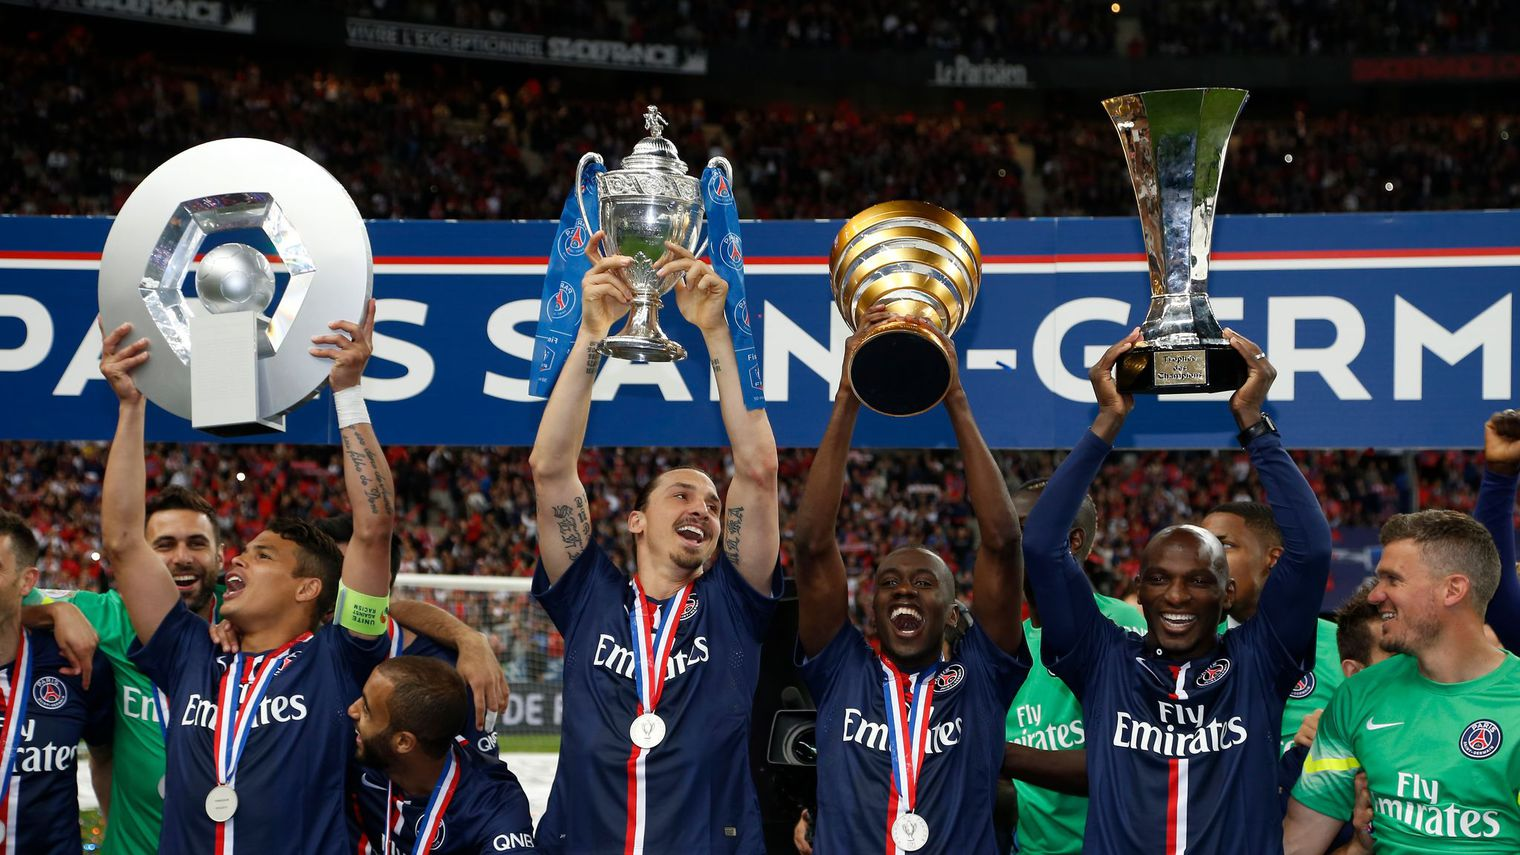 Le psg d tr ne l 39 om en battant un record transfert foot mercato - Coupe de la ligue france ...